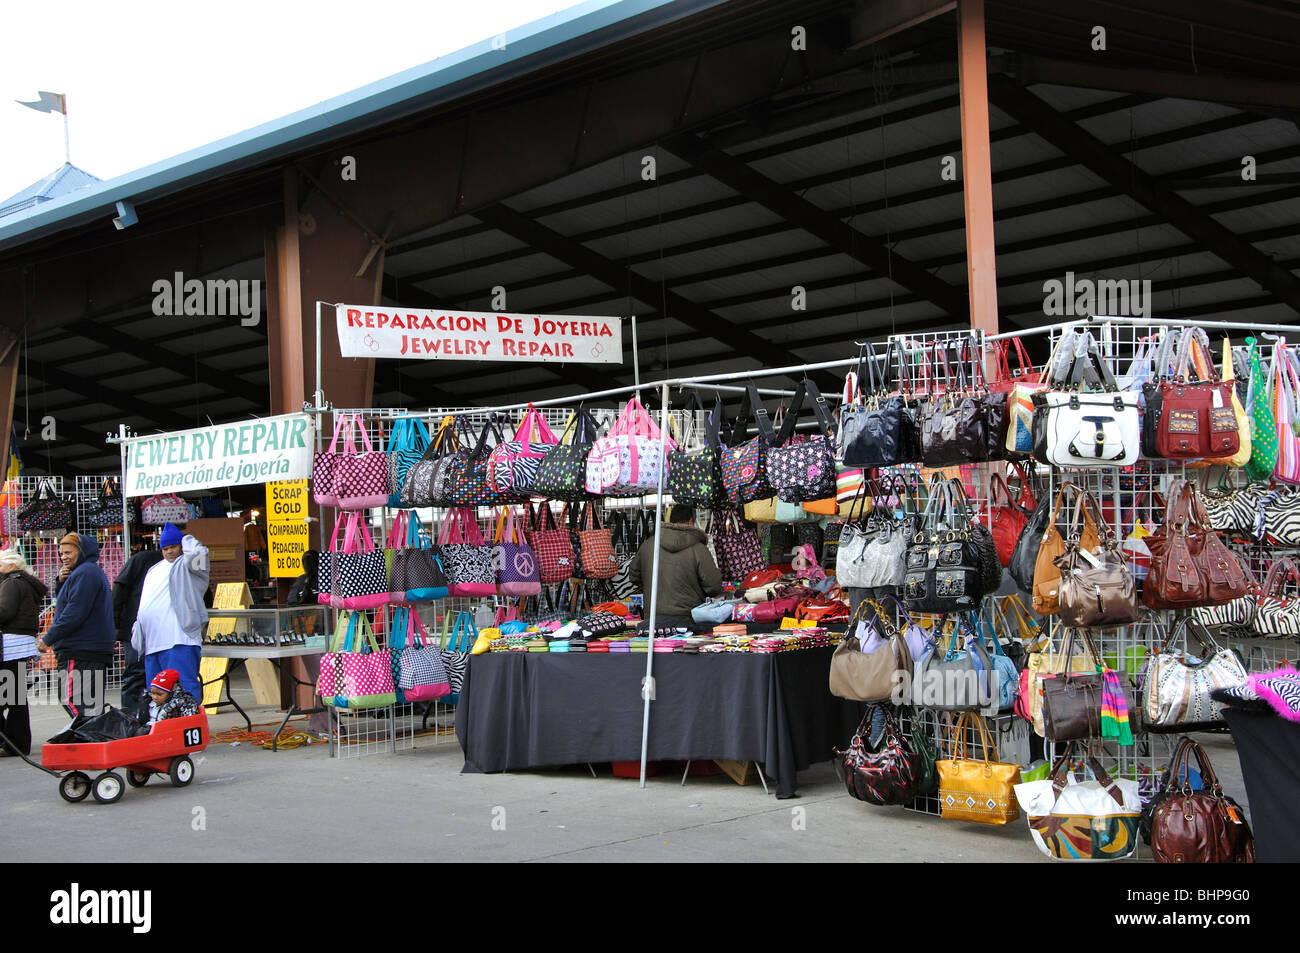 6e4835c1ff Fake designer handbags on sale Traders Village - biggest flea market in  Texas, Grand Prairie, TX, USA